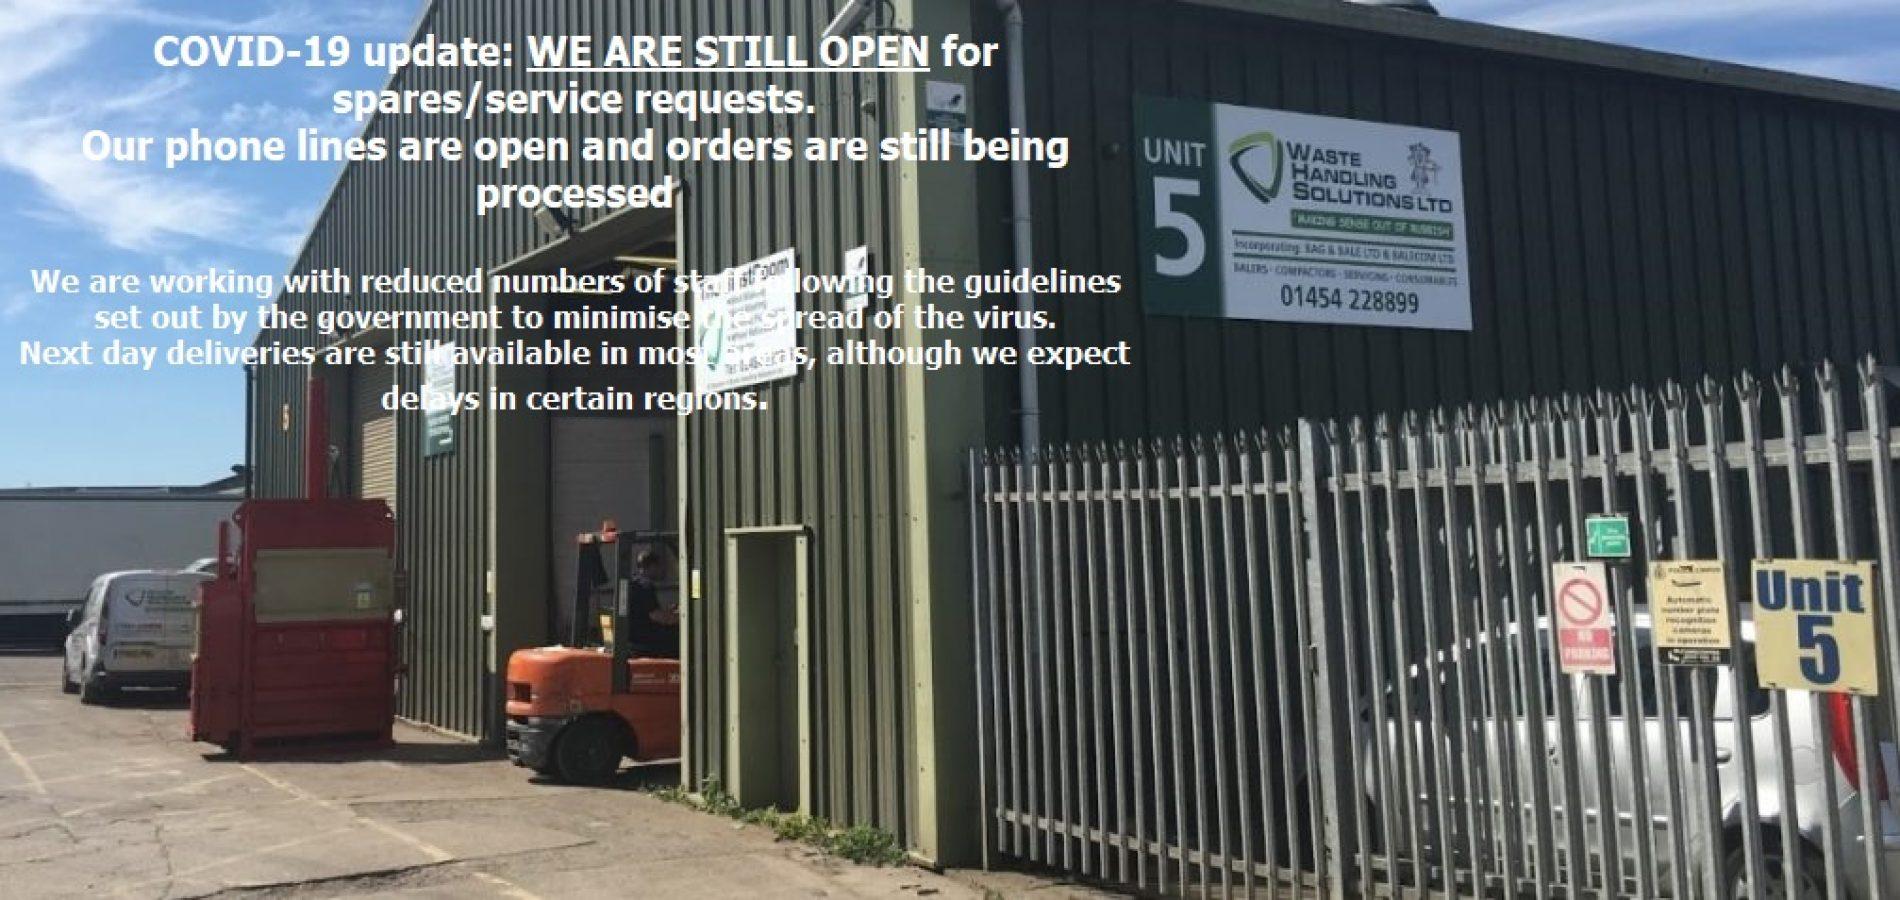 Waste Handling Solutions Ltd Building Covid 19 - Corona Virus